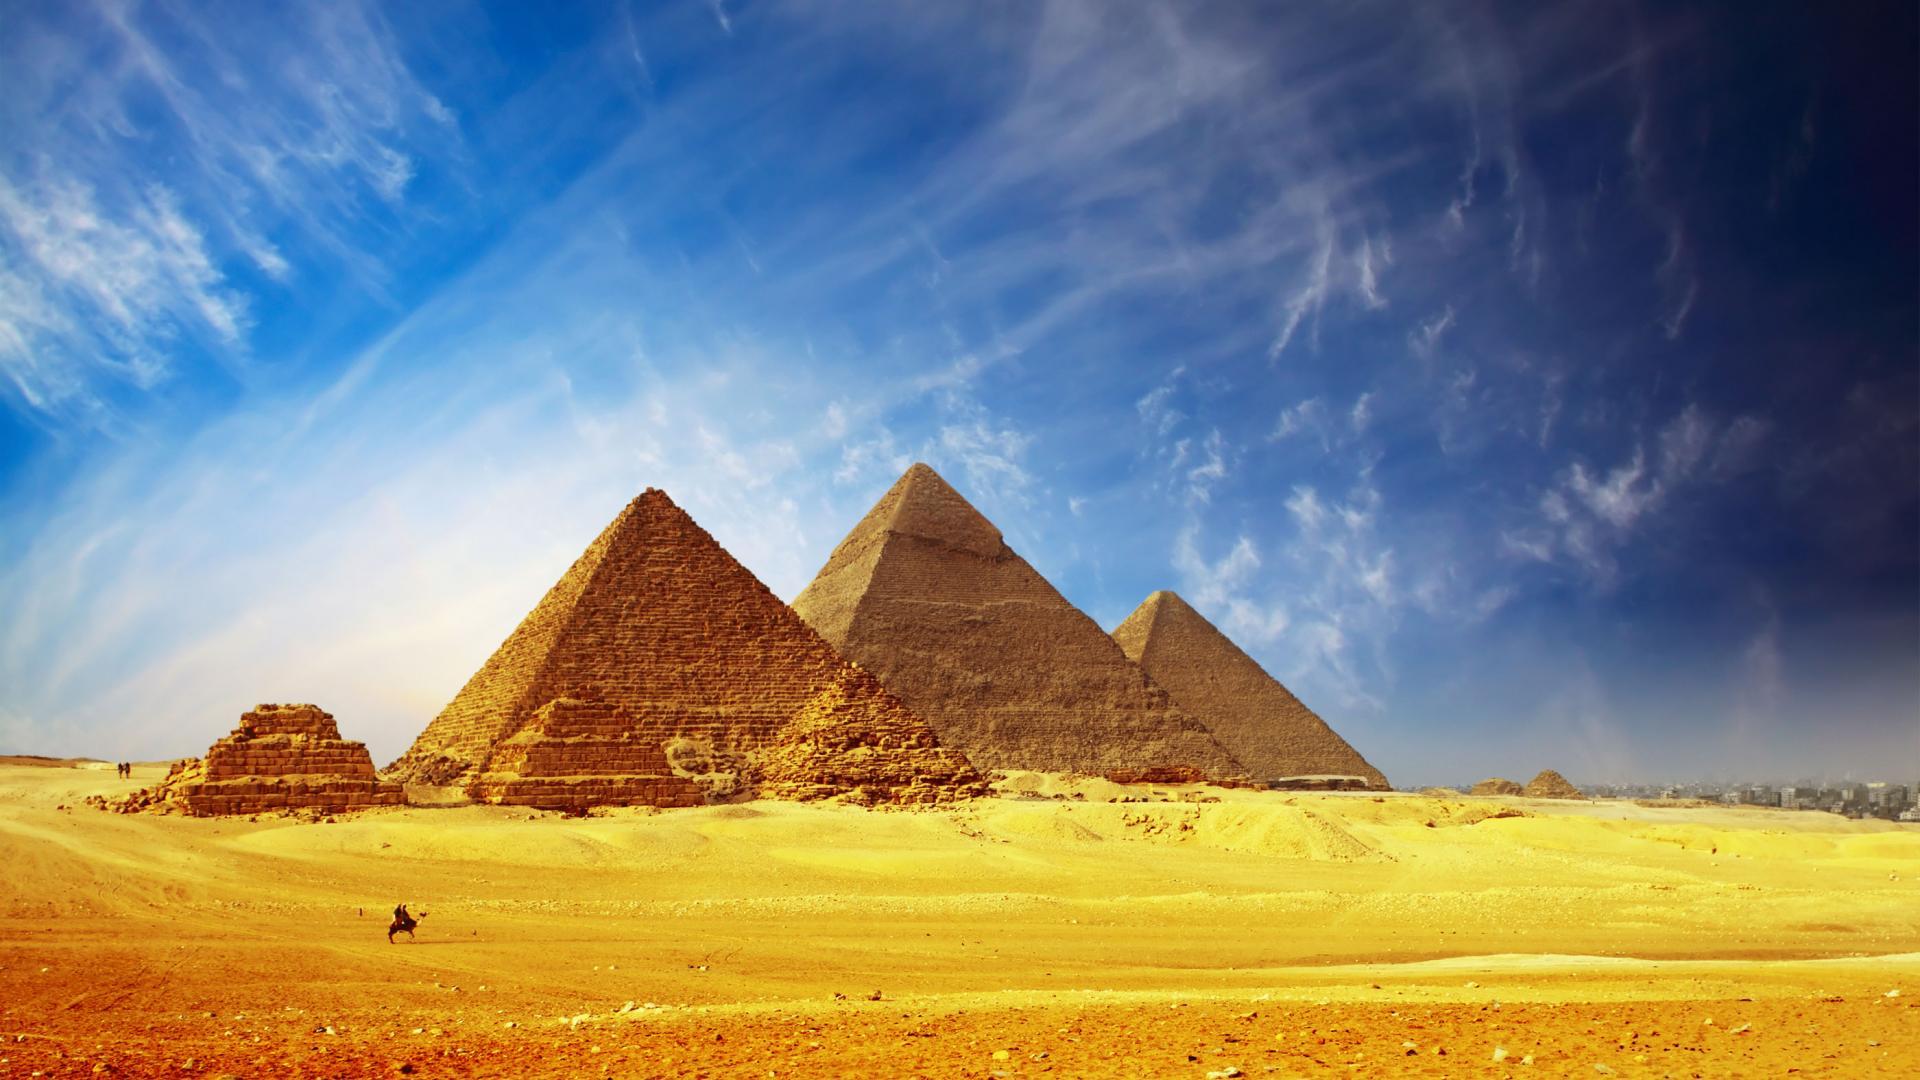 Pyramid Of